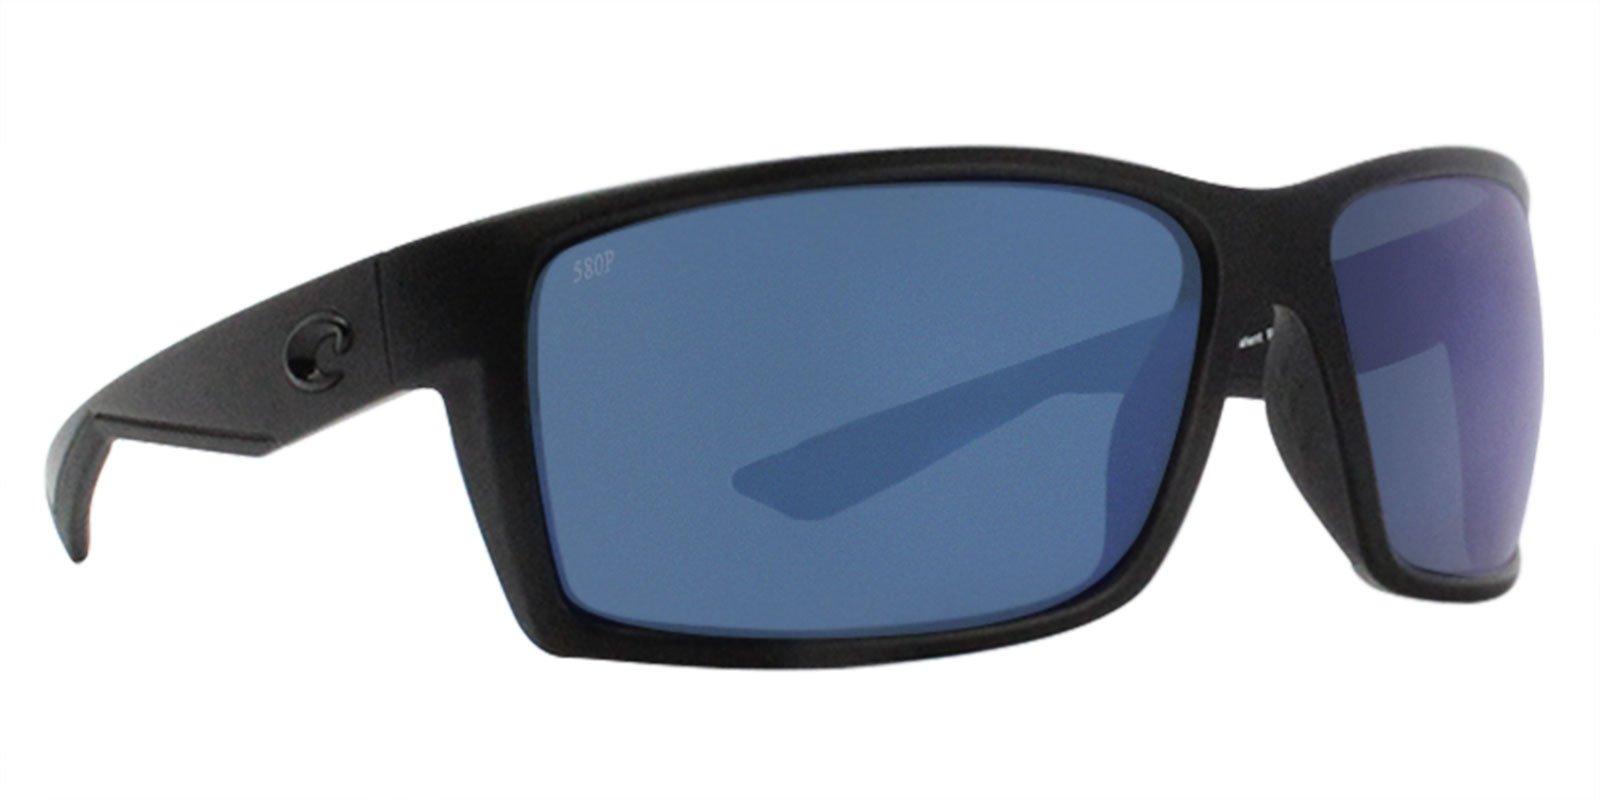 Costa Del Mar Reefton Sunglasses Blackout / Blue Mirror 580Plastic by Costa Del Mar